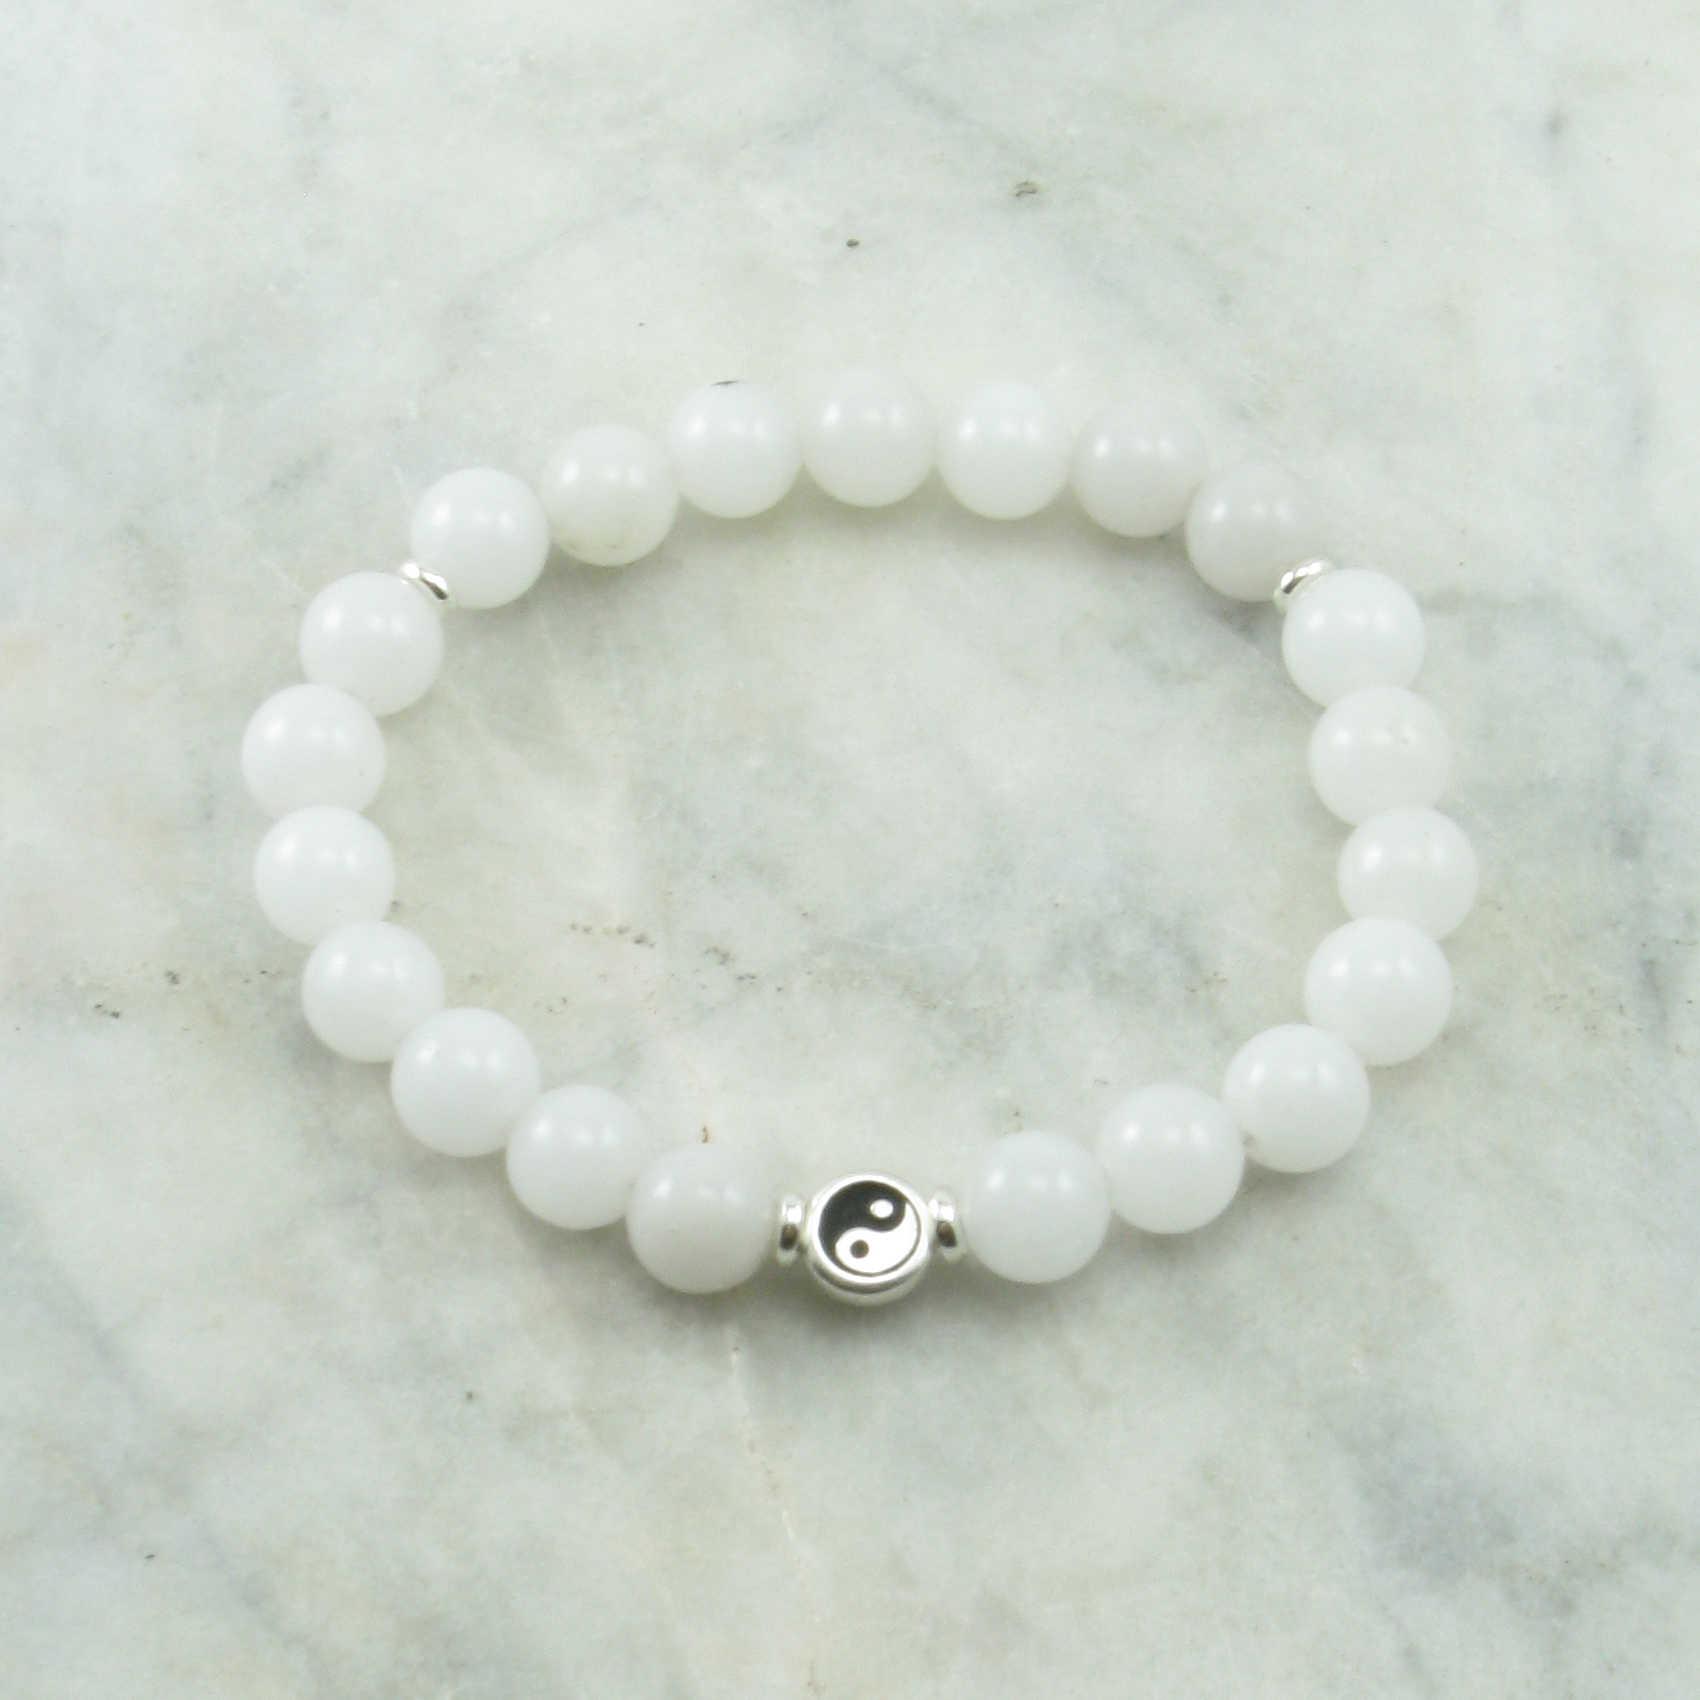 Yin Yang Mala Bracelet